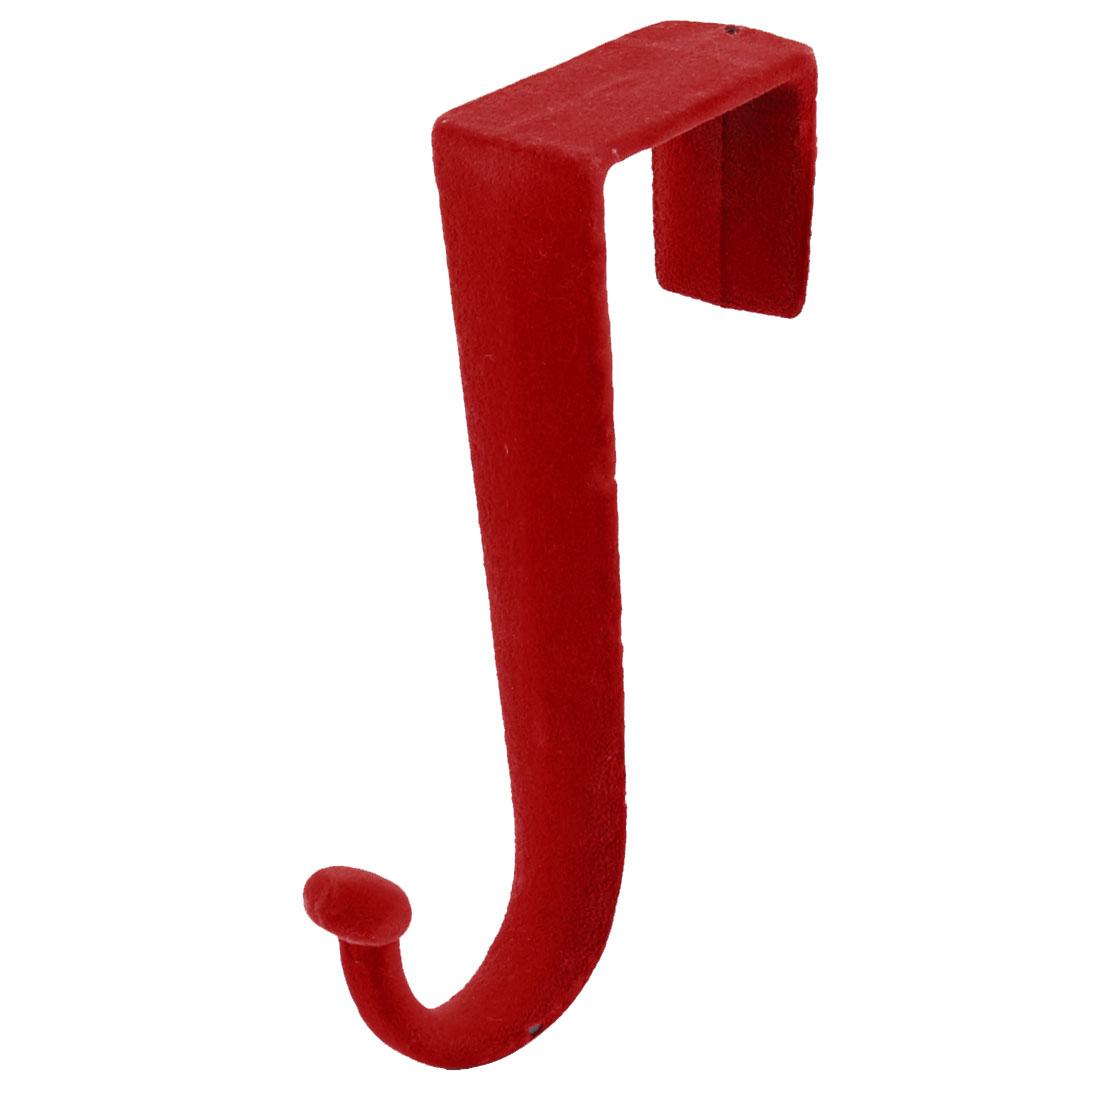 Household Plastic Z Shaped Over Door Hooks Clothes Towel Hanger Holder Red